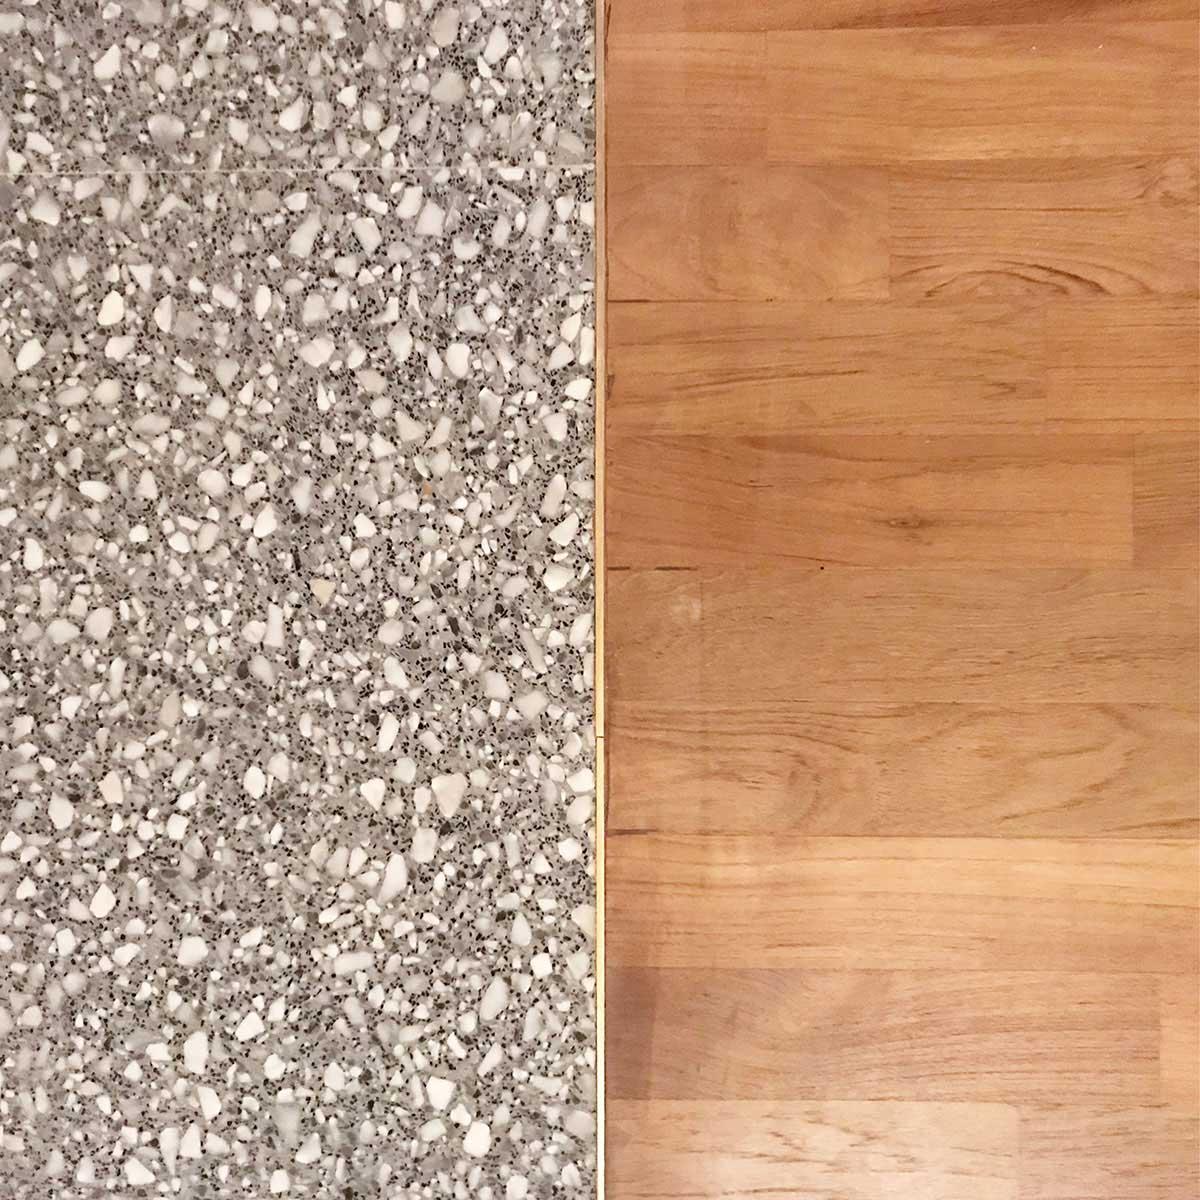 kickoffice casa cb hallway material detail floor parquet grit